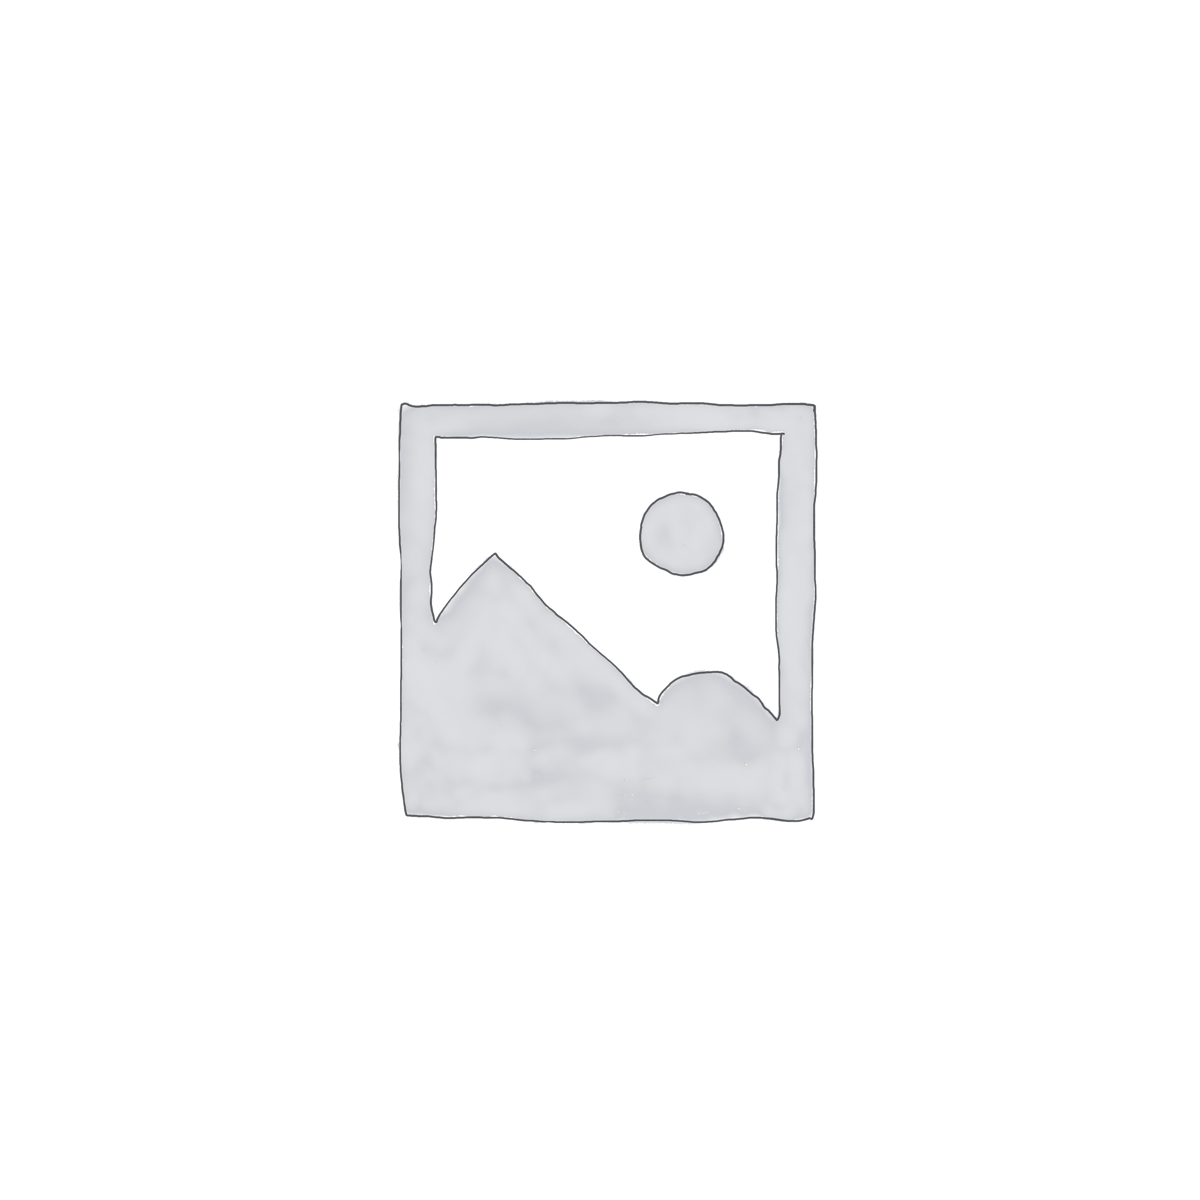 Default category placeholder image